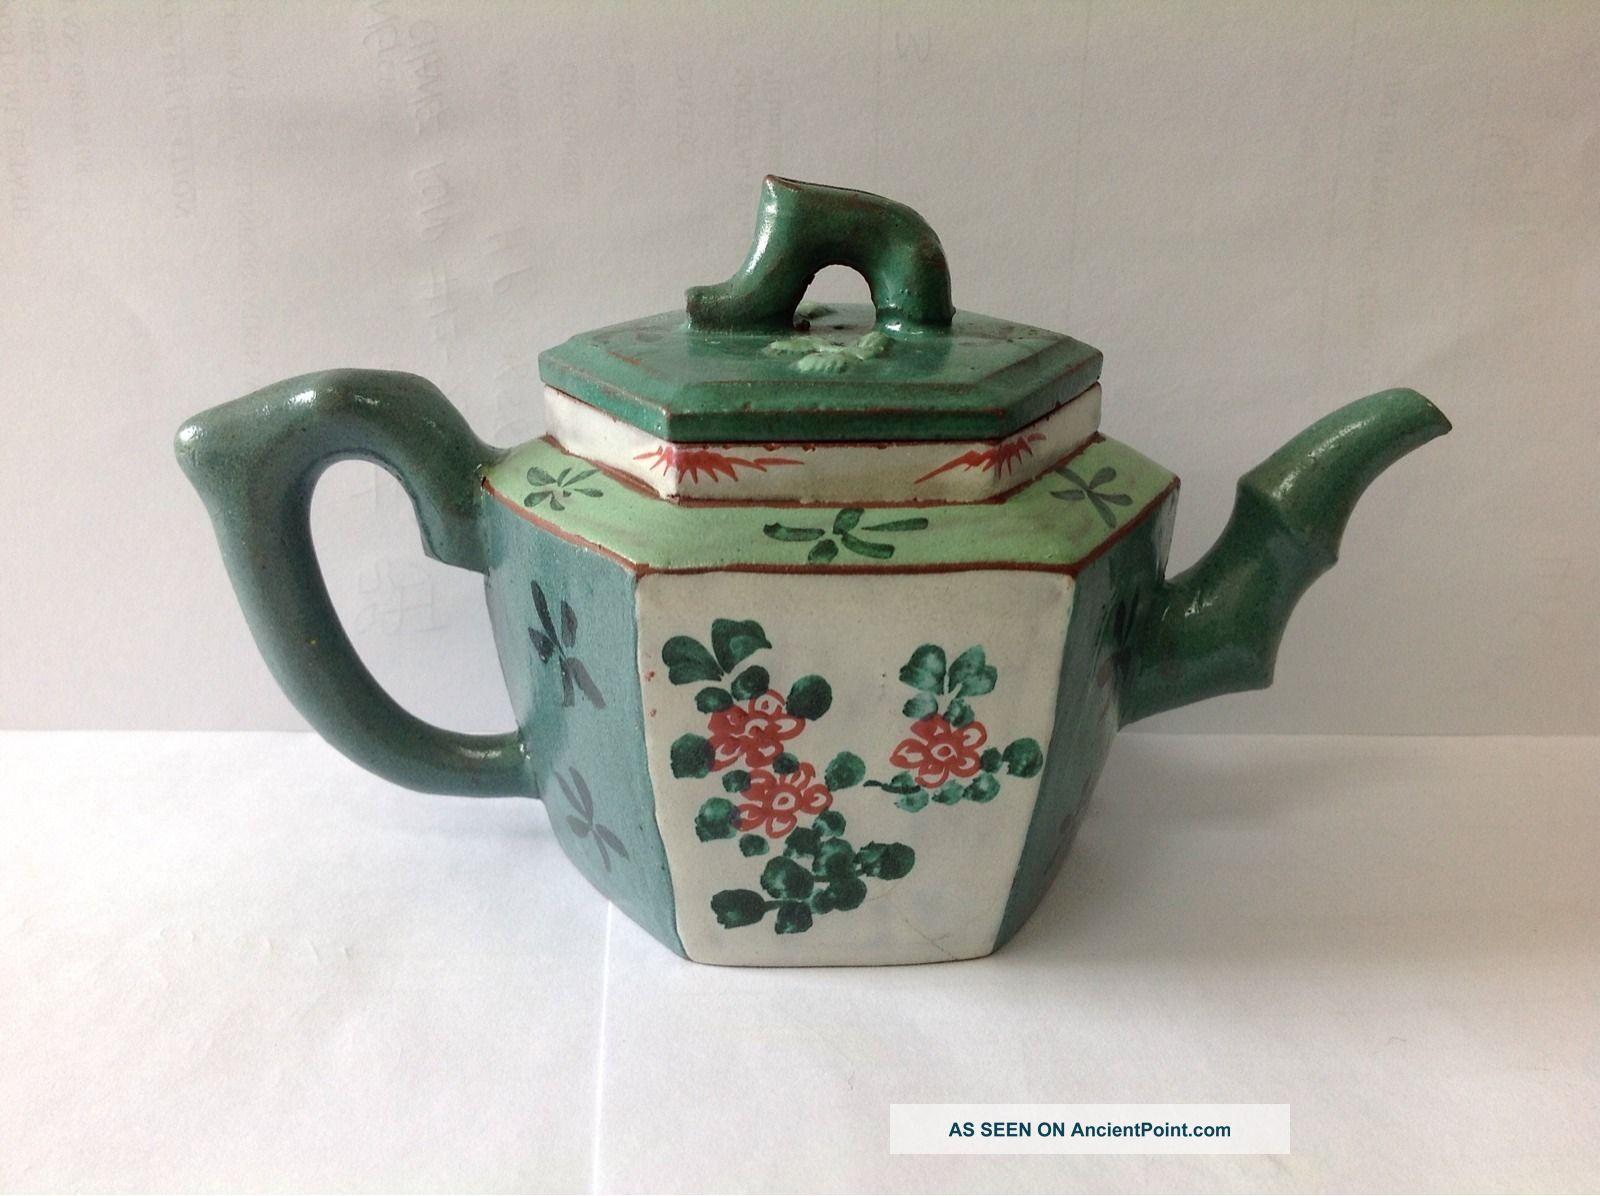 Mid Qing Dynasty Yixing Zisha Teapot Teapots photo